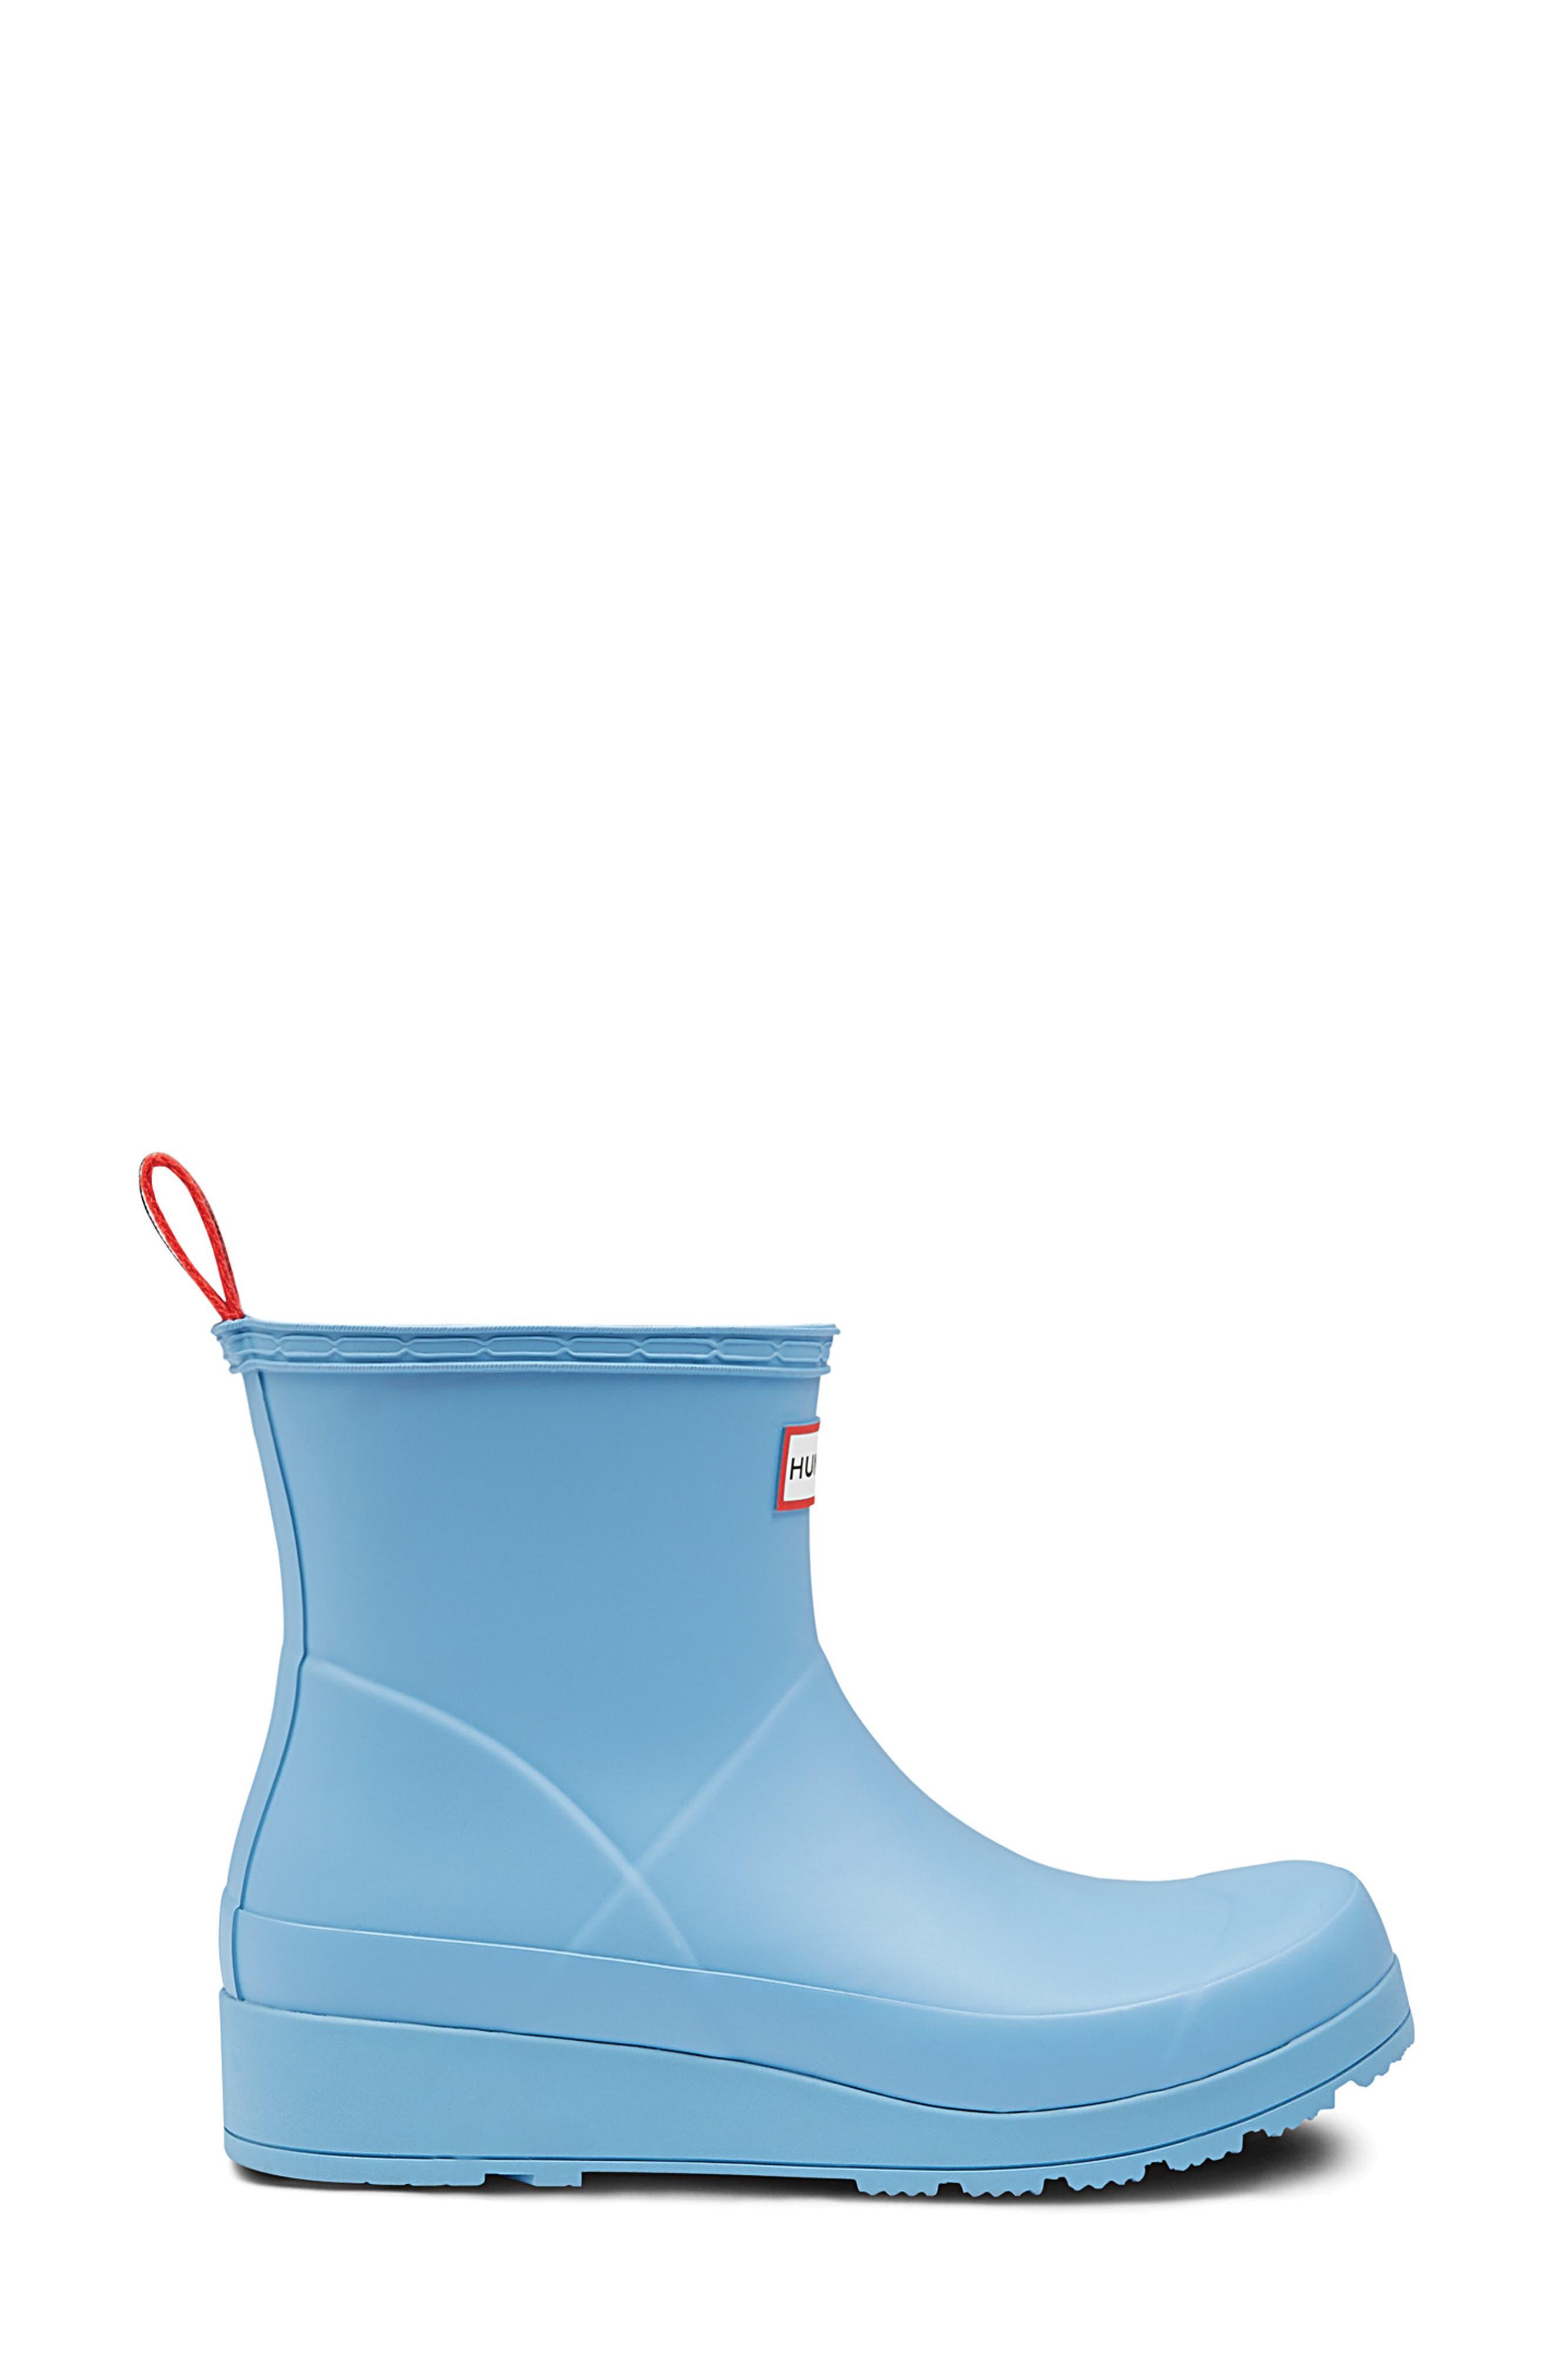 Original Play Waterproof Rain Bootie,                             Alternate thumbnail 3, color,                             496